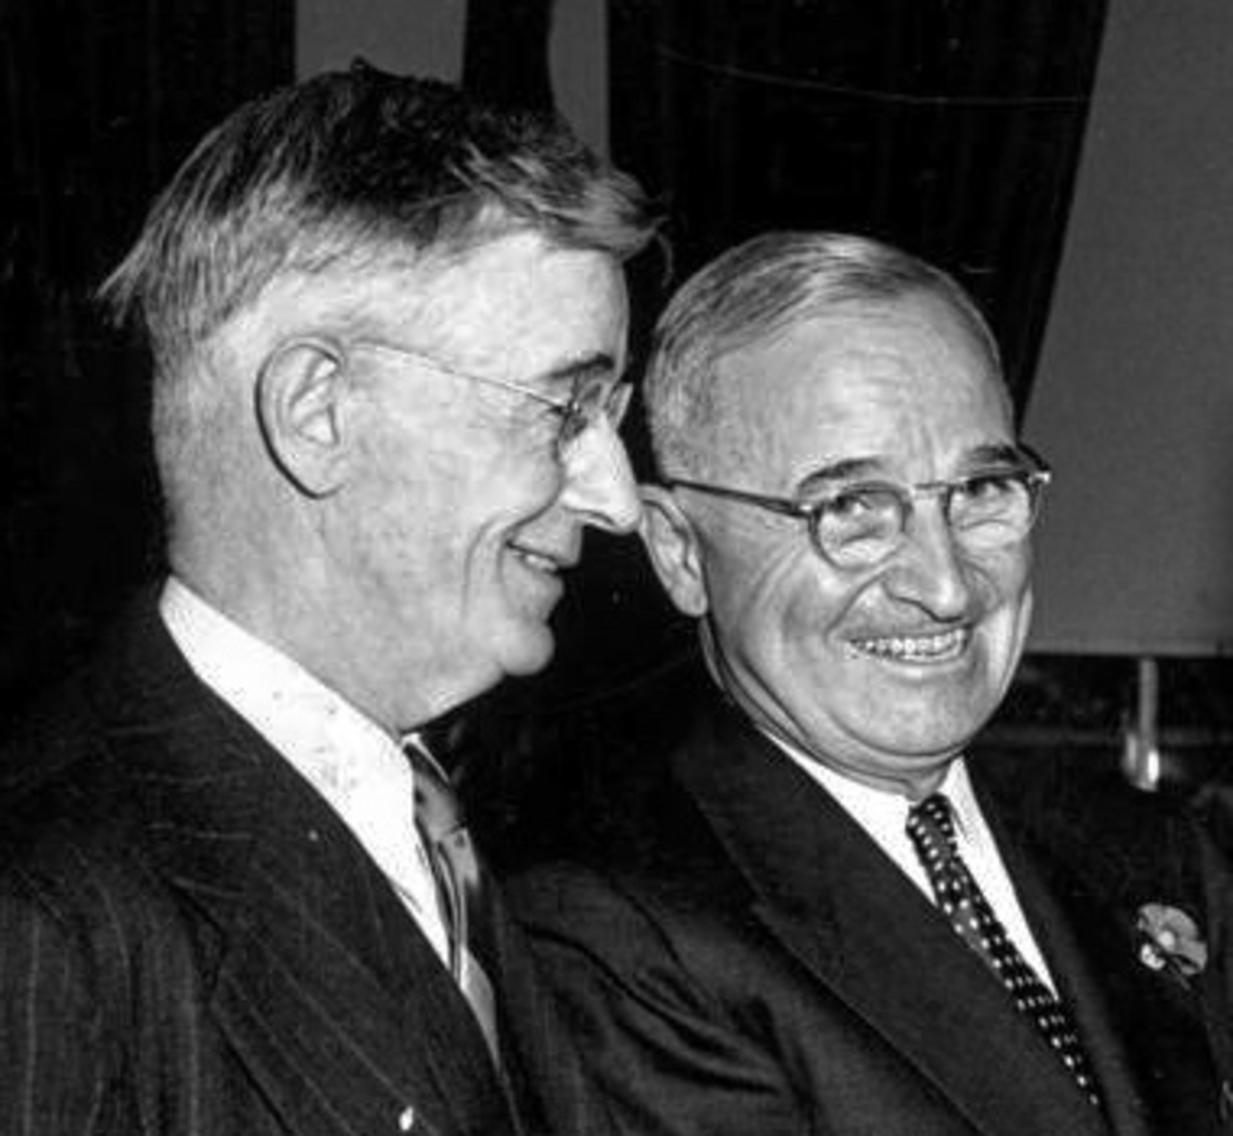 Vannevar Bush had the ear of President Truman